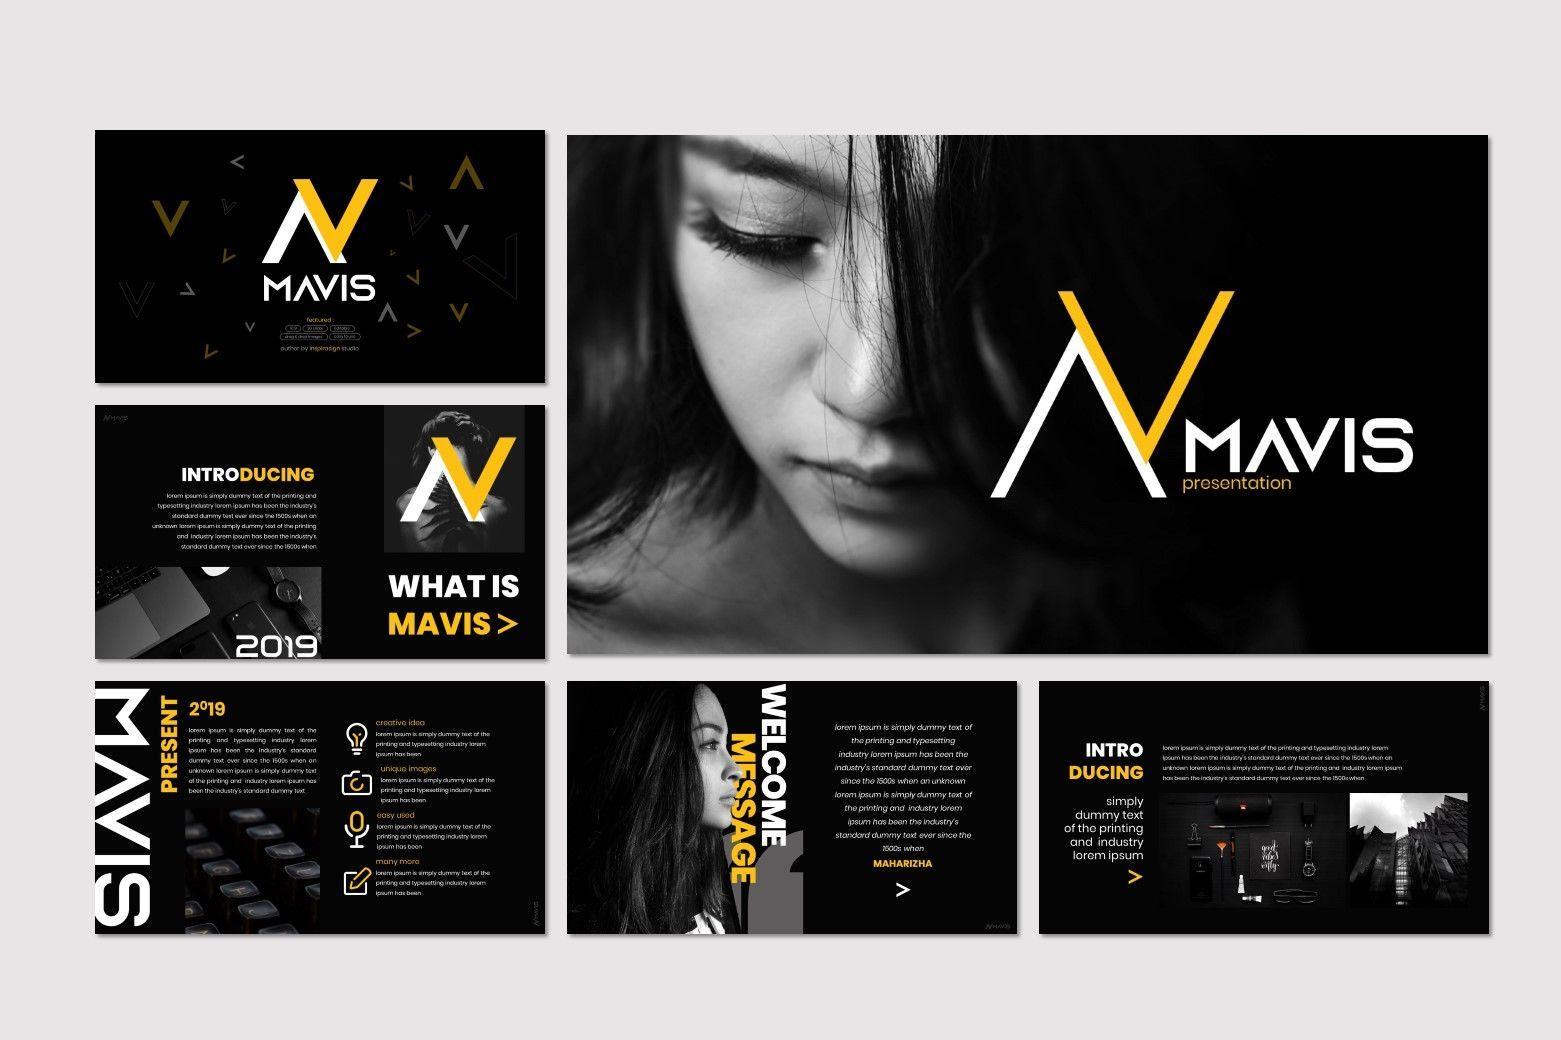 Mavis - PowerPoint Template, Slide 2, 07266, Presentation Templates — PoweredTemplate.com